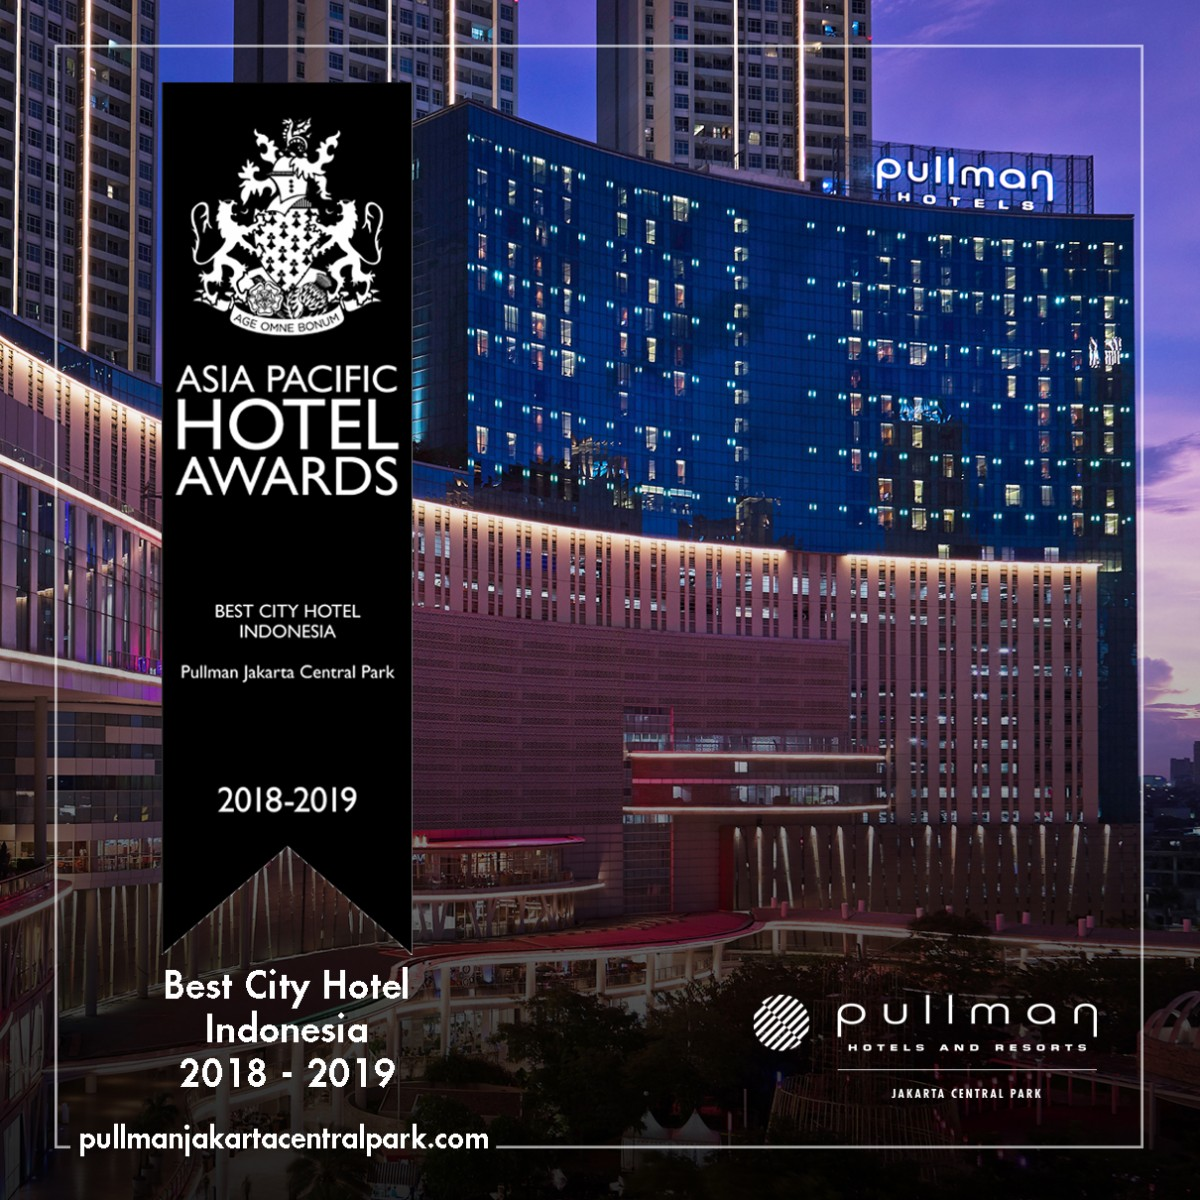 Pullman Jakarta Central Park Pullman Jakarta Central Park Winning Asia Pacific Hotel Awards 2018 Best City Hotel